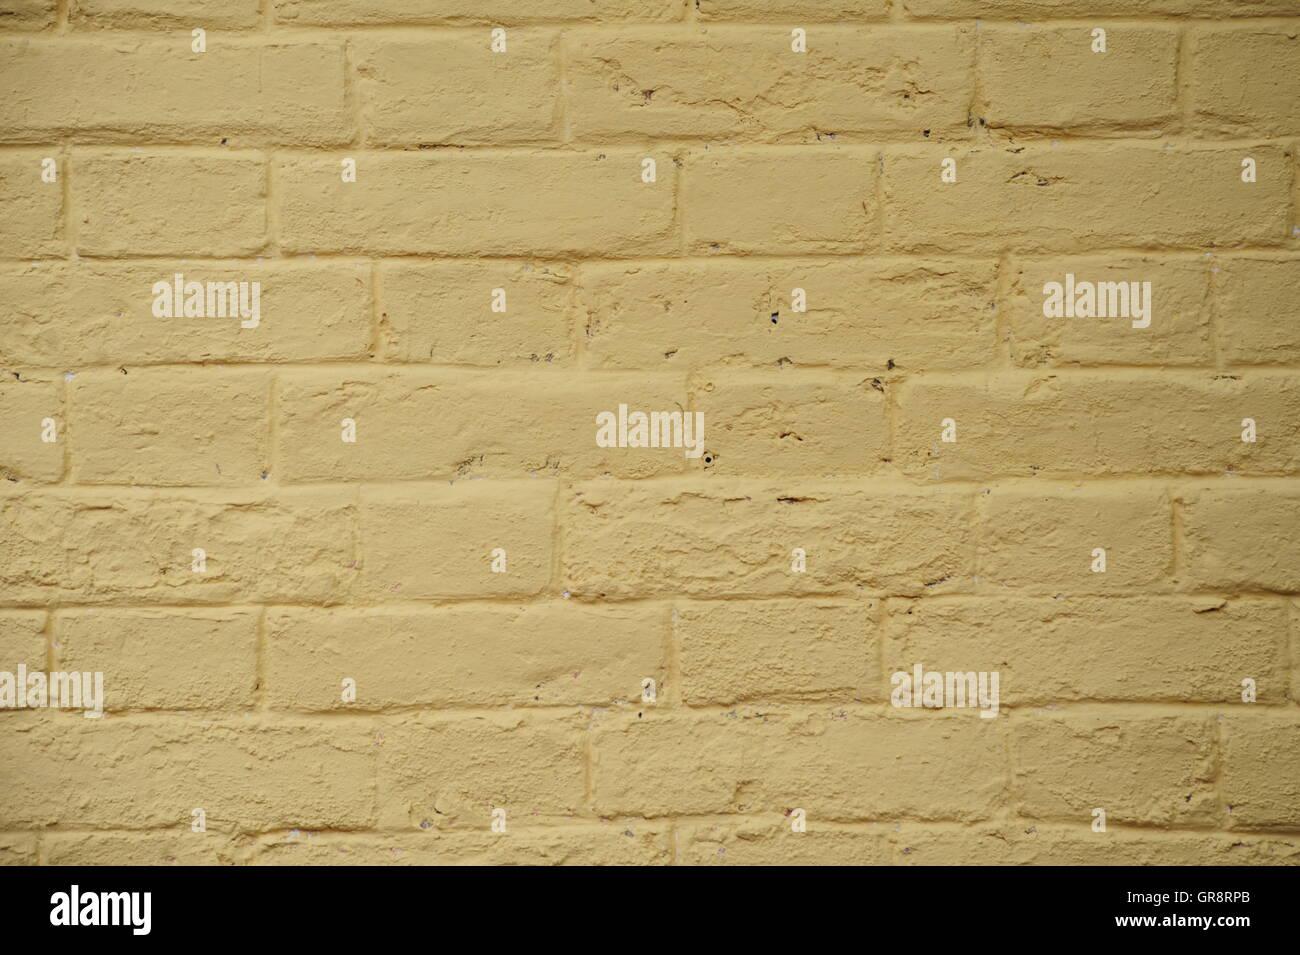 Yellow Bricks Stock Photos & Yellow Bricks Stock Images - Alamy